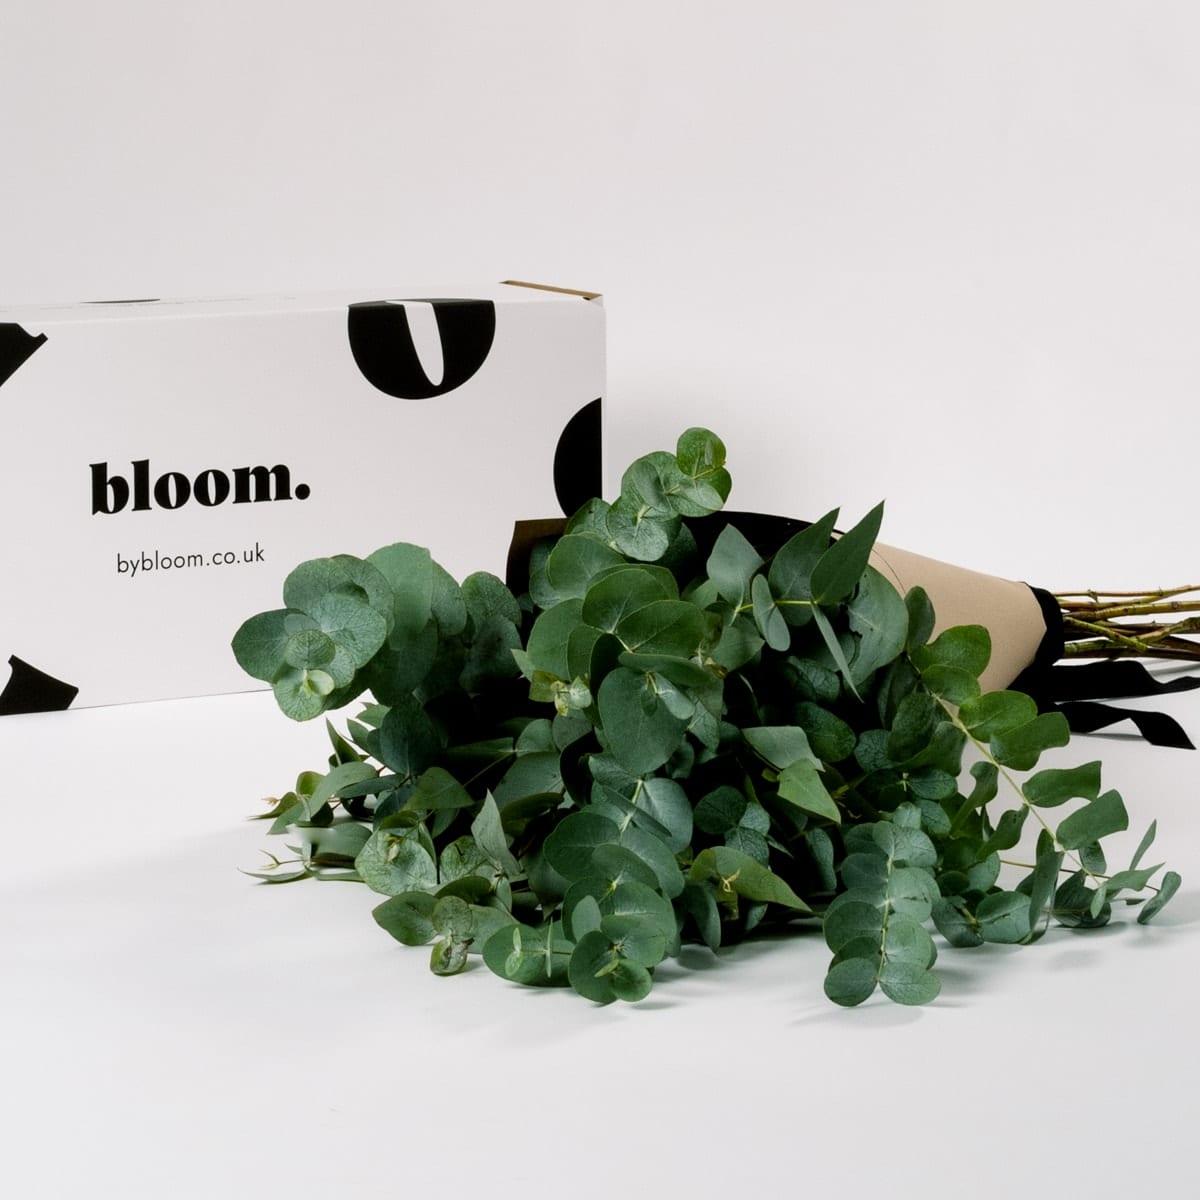 Bloom Flower Delivery | Green Eucalyptus